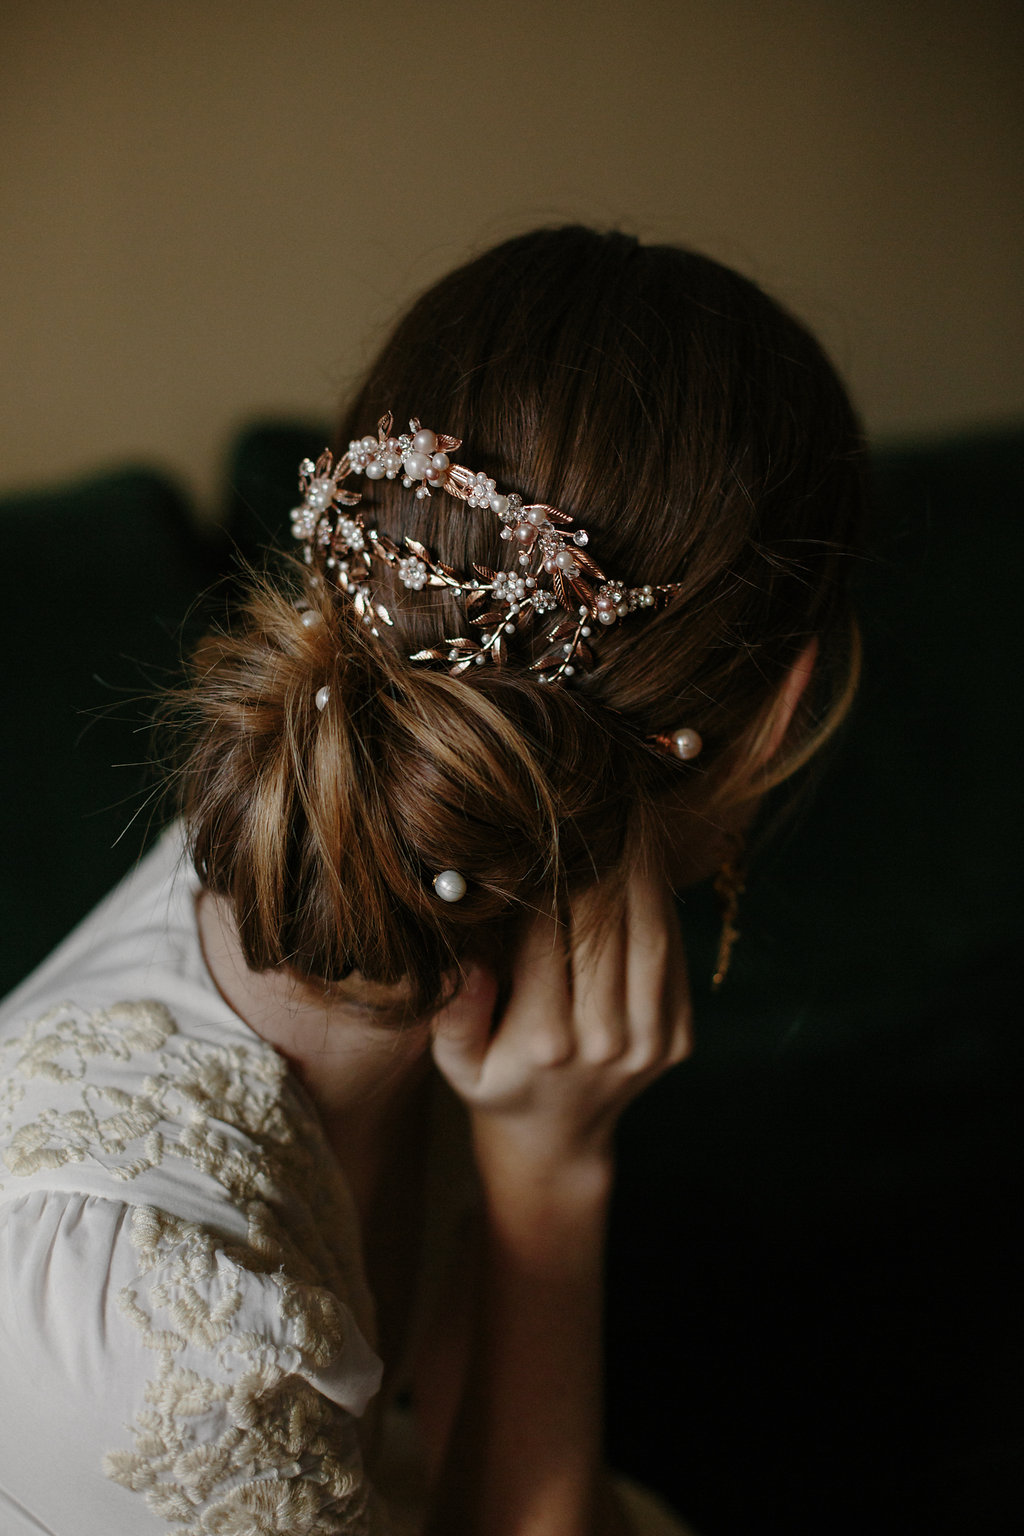 bridal hair accessory, wedding headpiece, mantilla comb, back